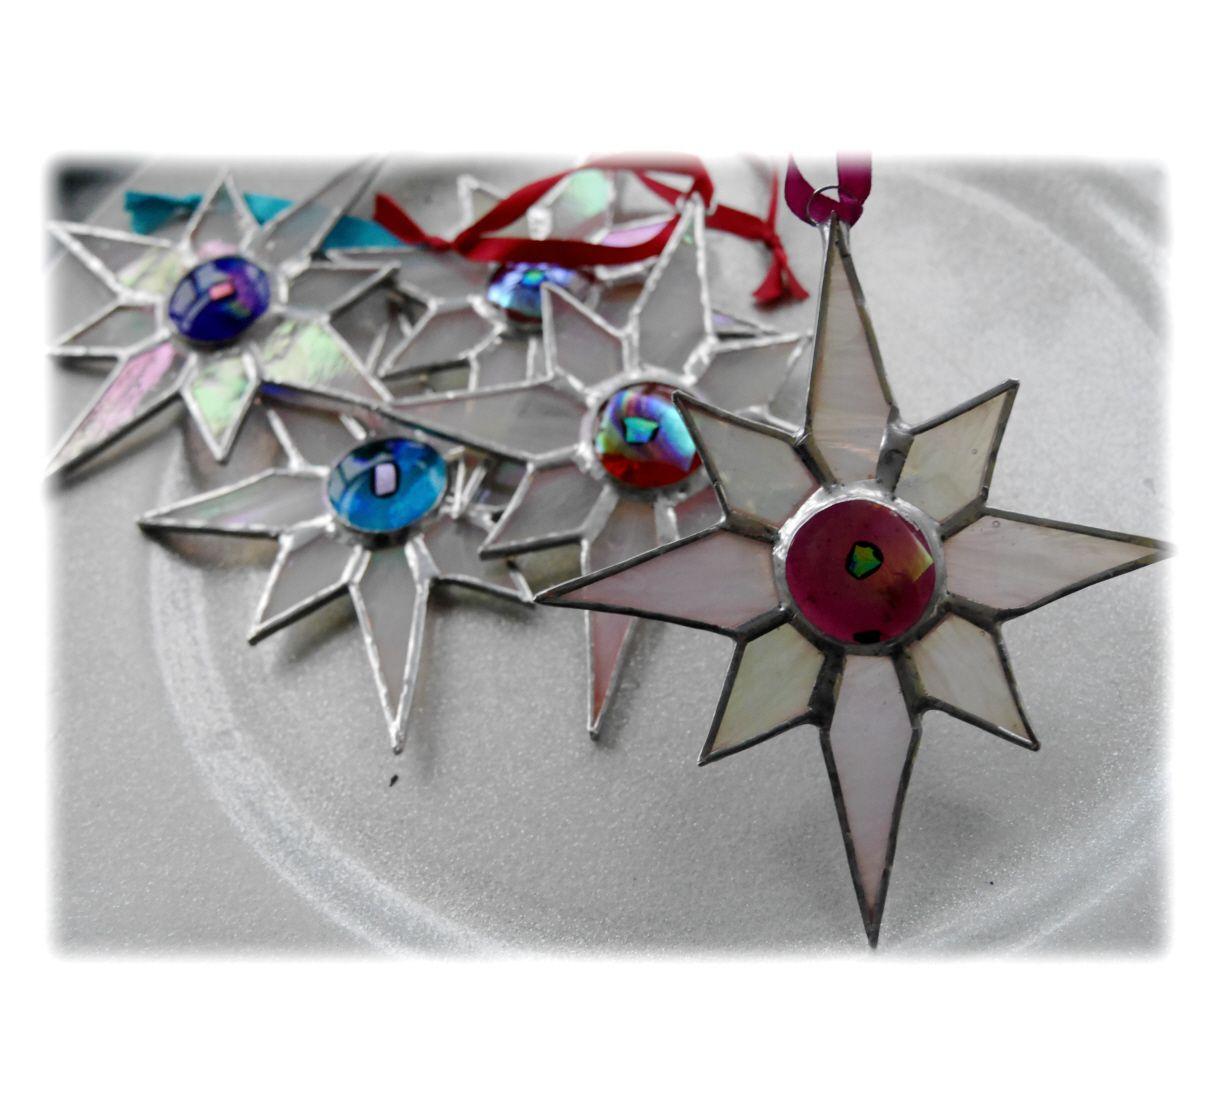 White dichroic star 005 Plum #1810 FREE 9.00